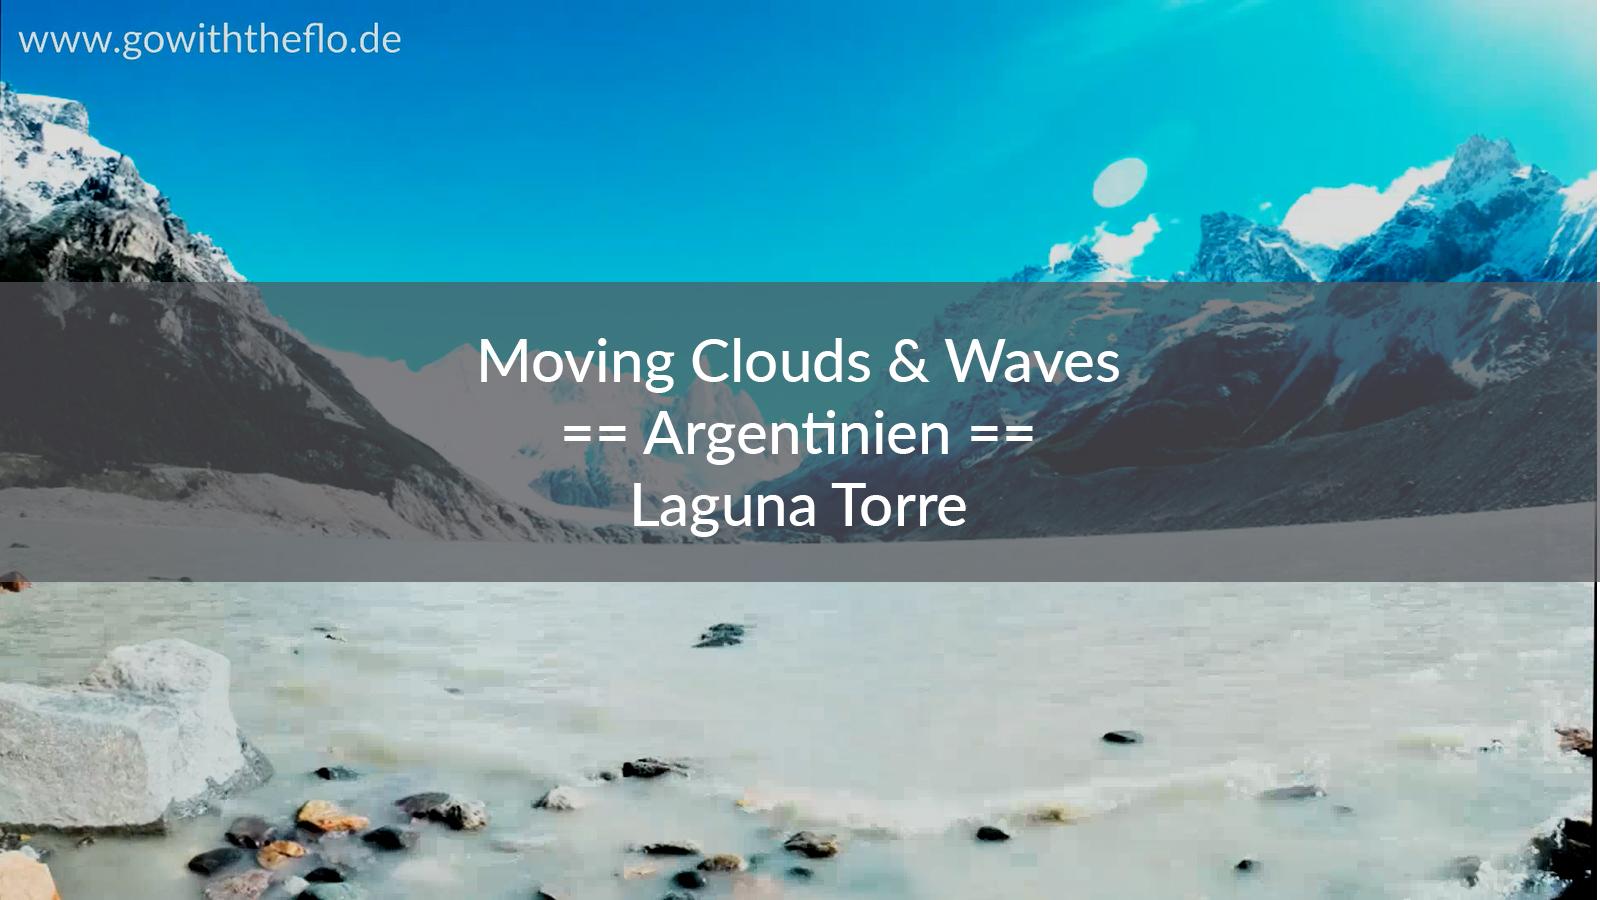 Argentinien – Relaxing at Laguna Torre